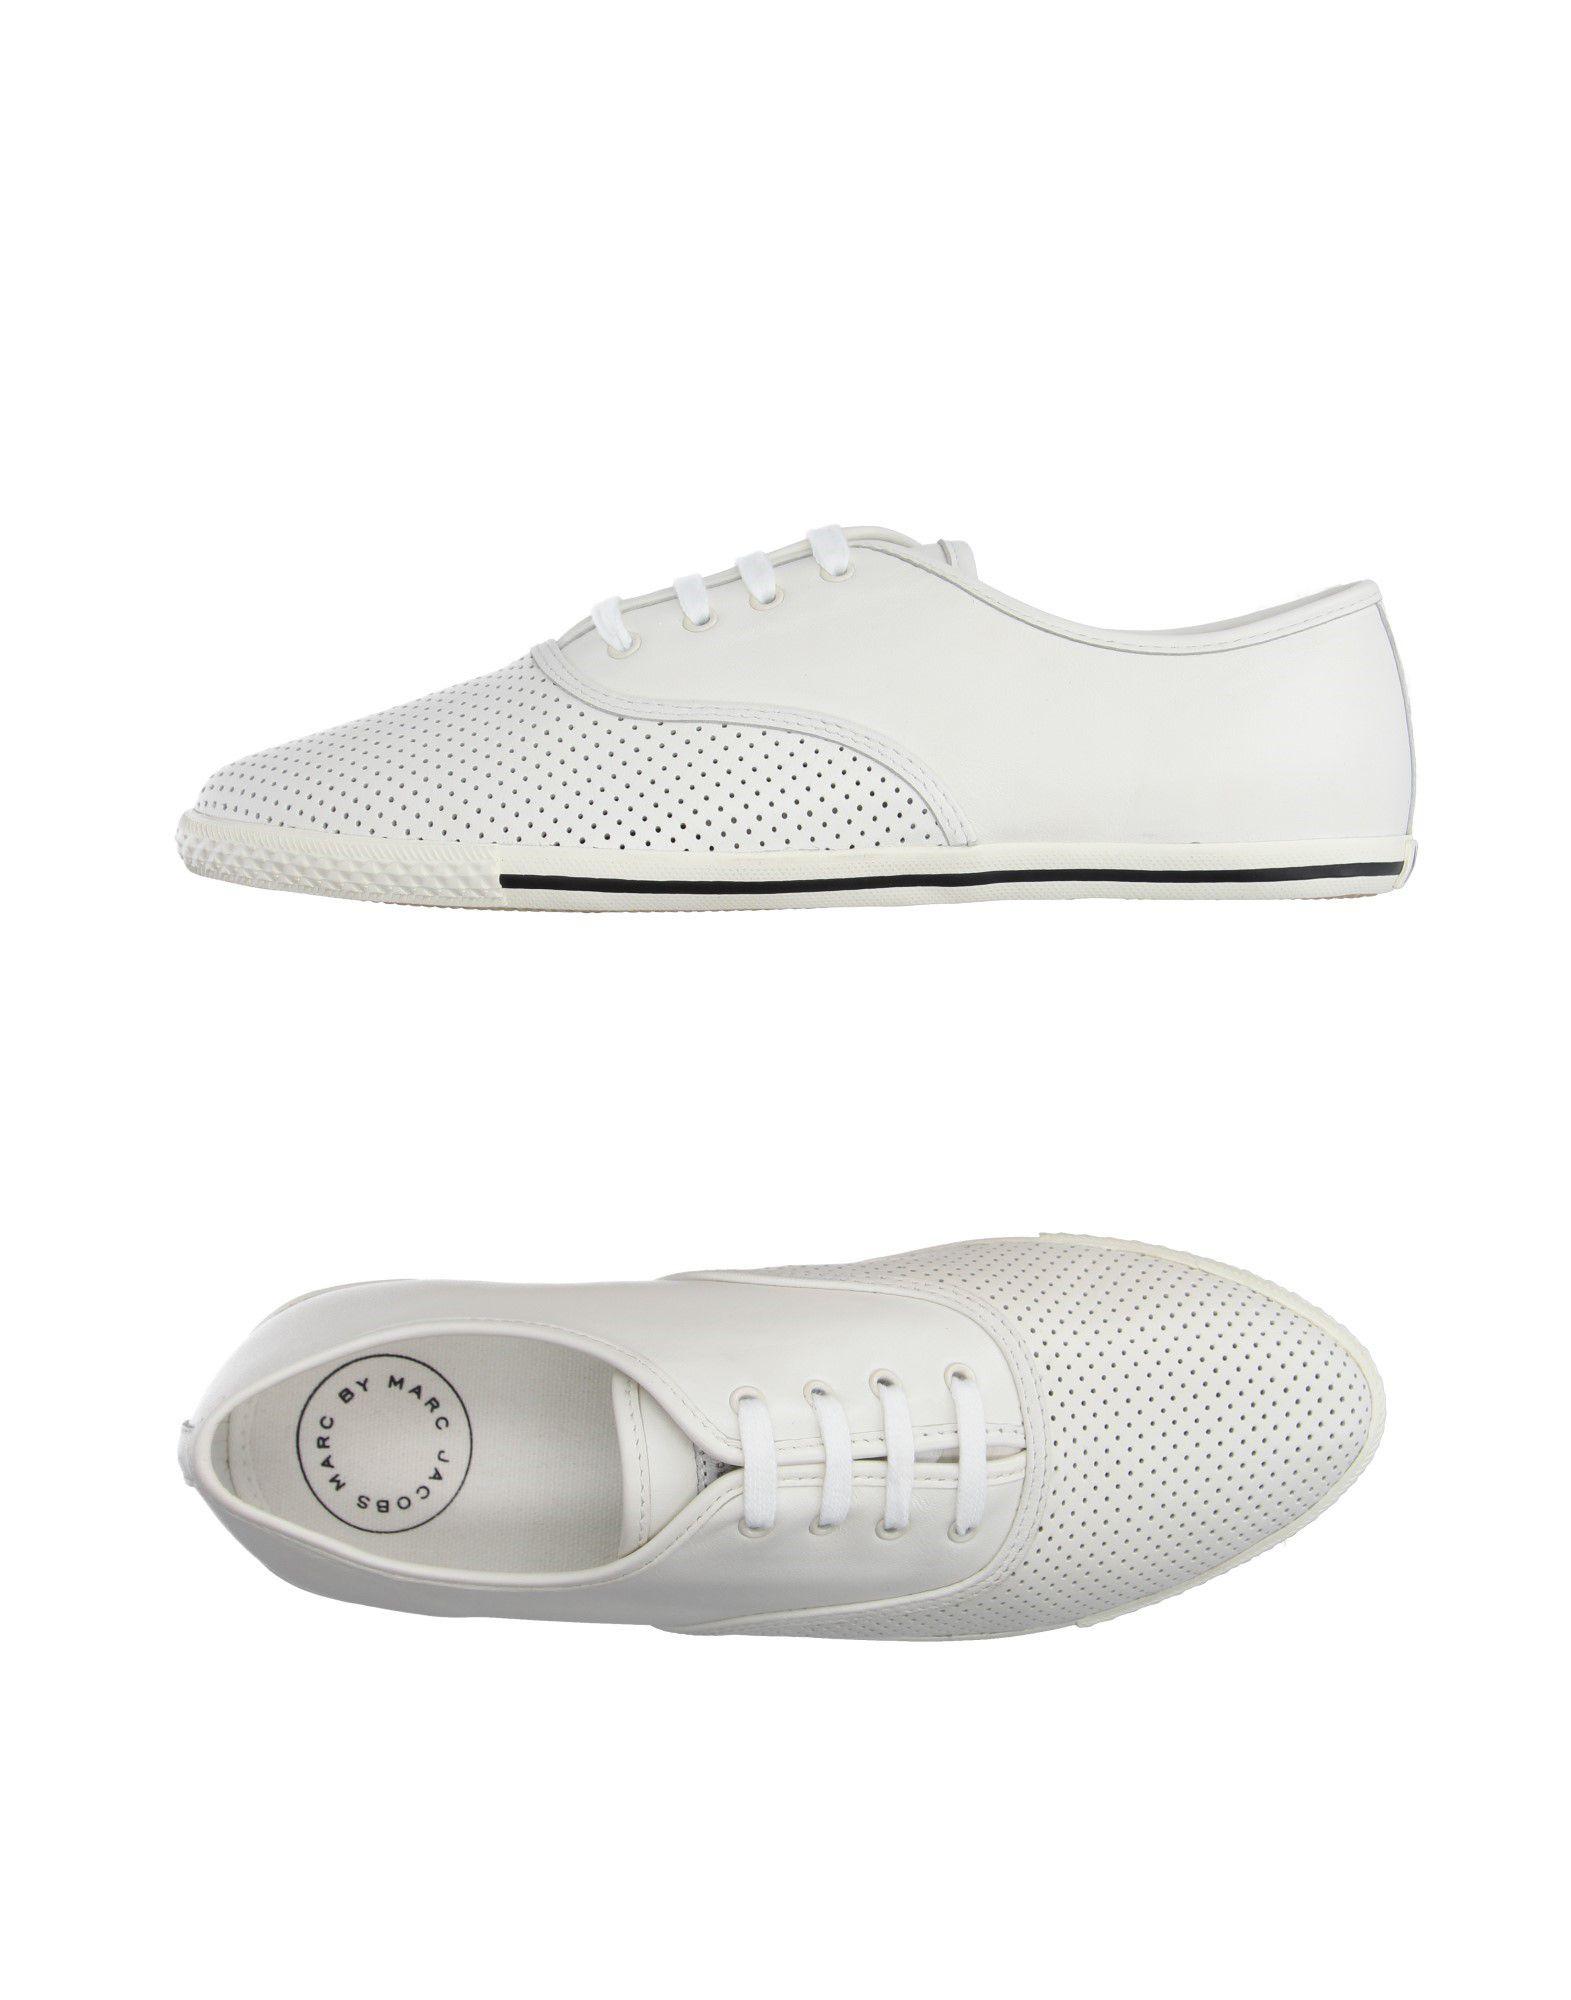 Stilvolle billige Schuhe Marc By Marc Jacobs Sneakers Damen  11116911QN